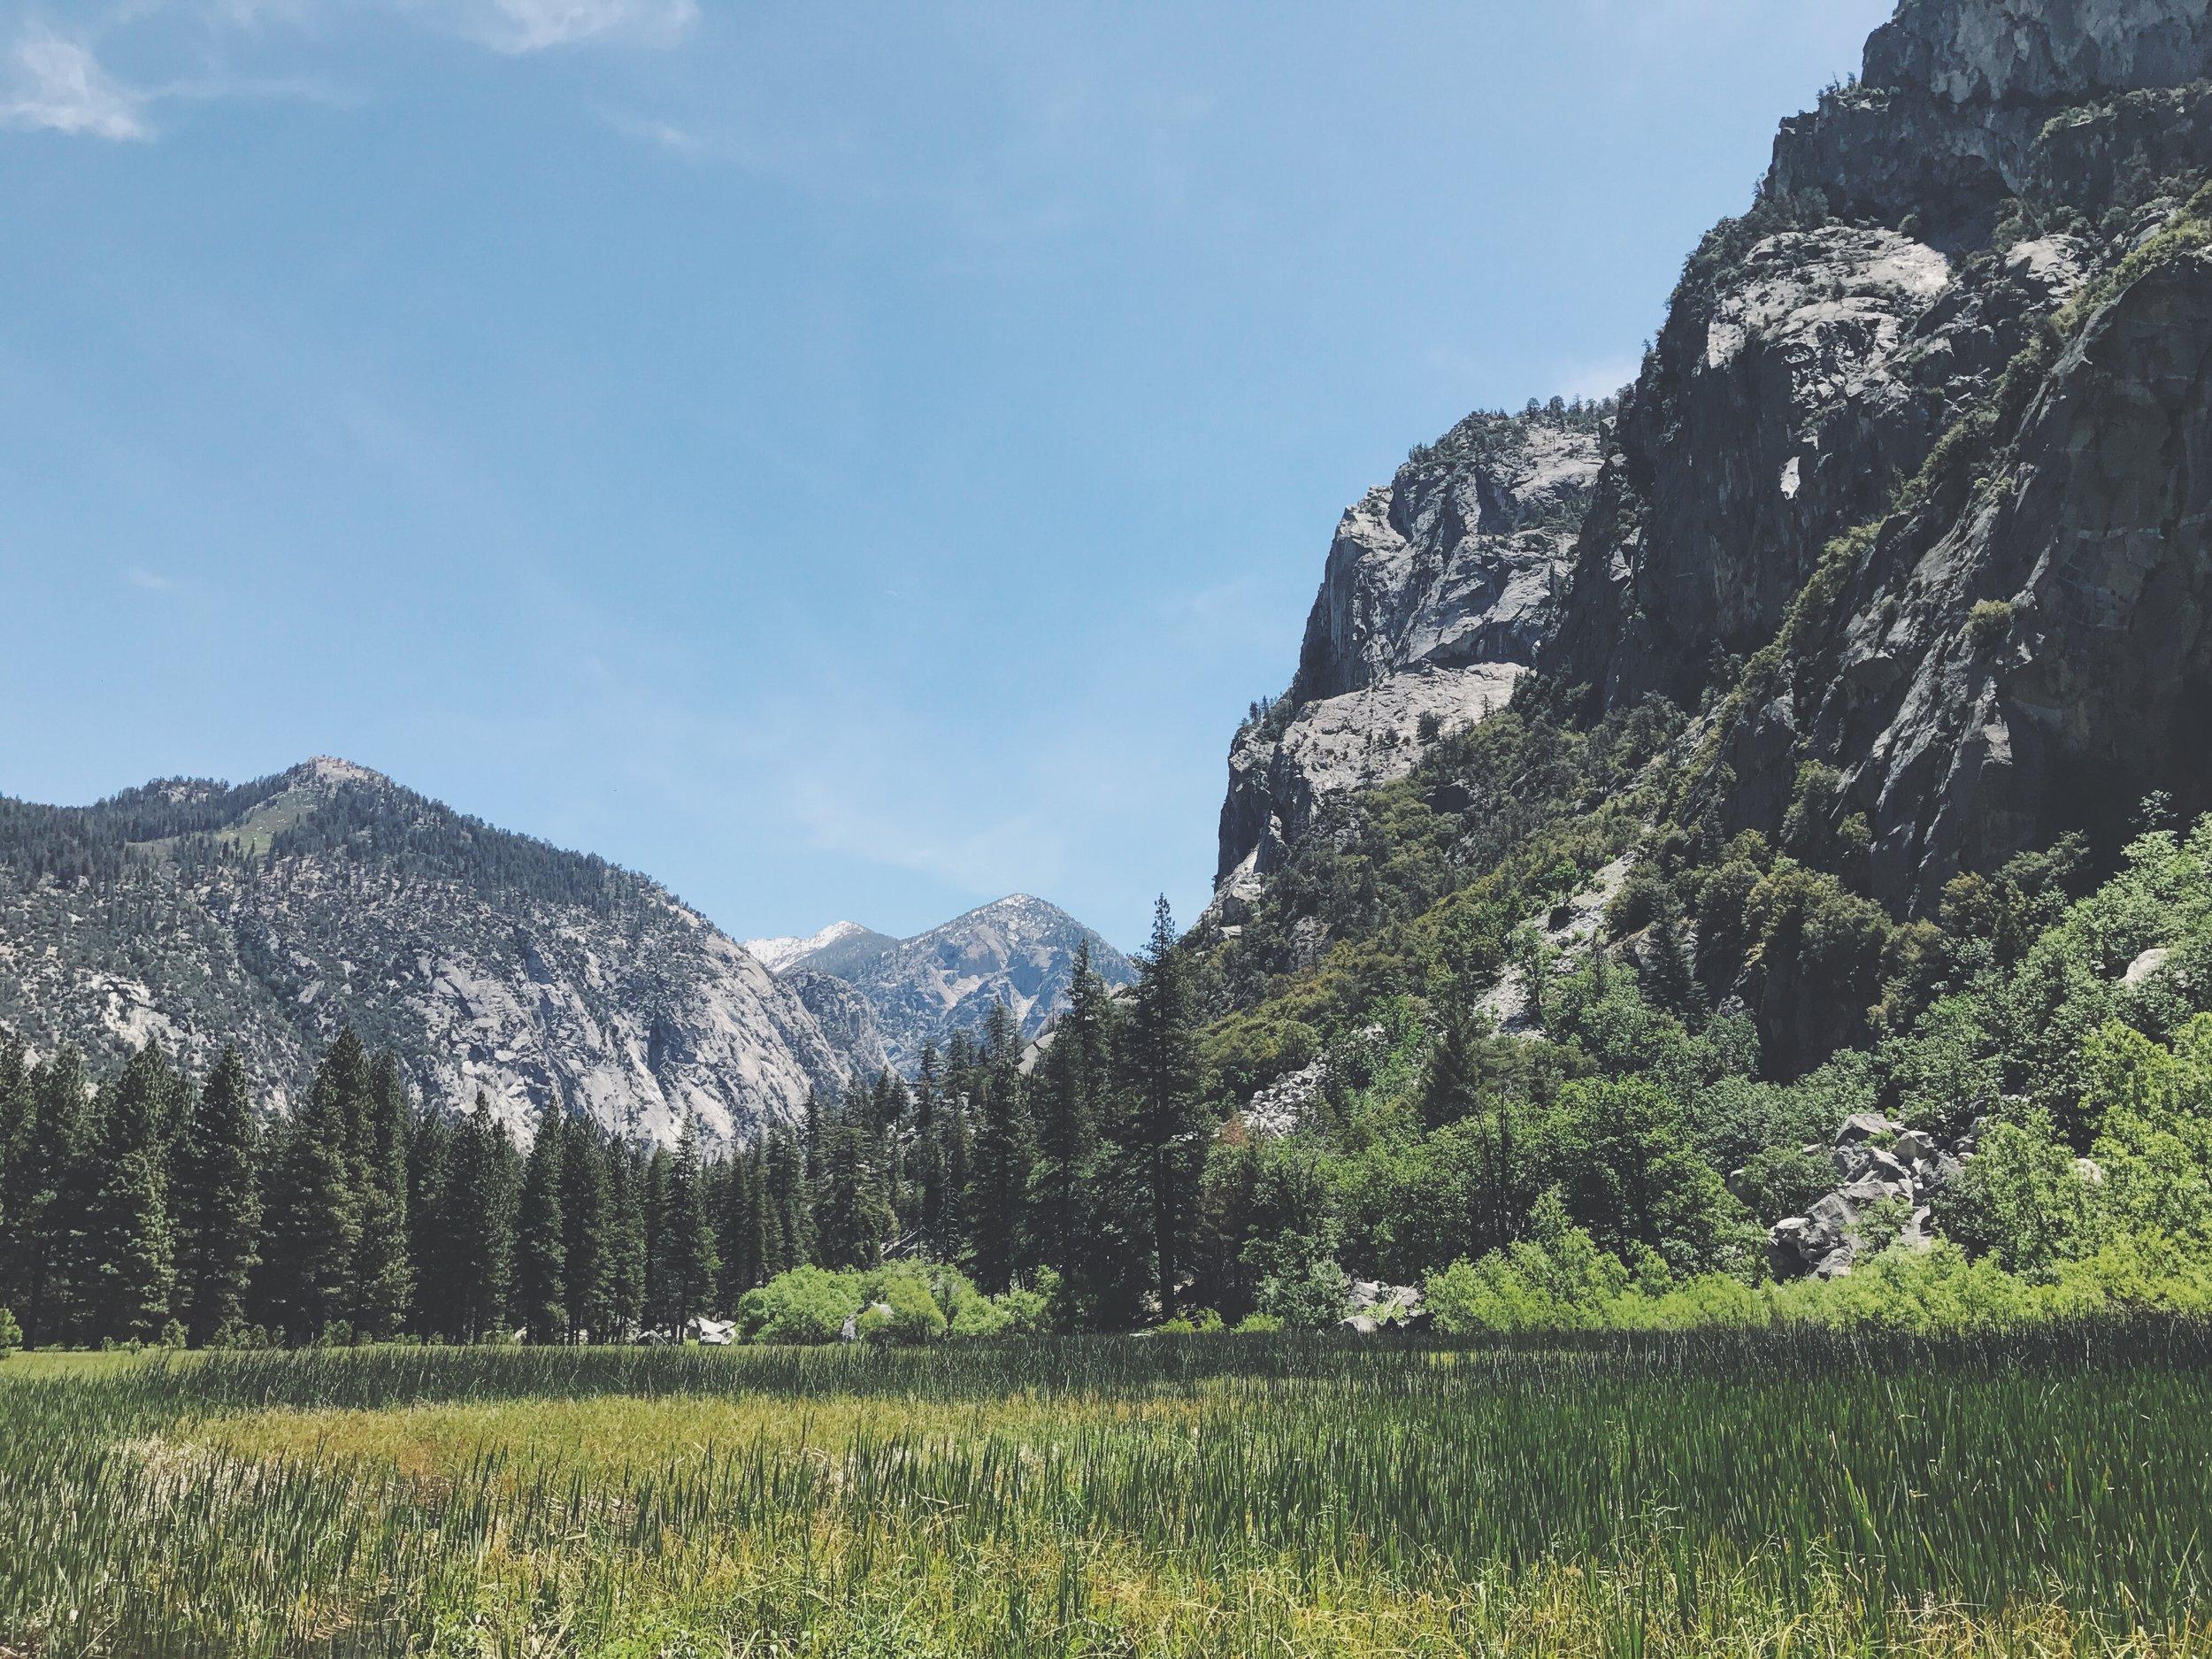 View across Zumwalt Meadow in Kings Canyon National Park